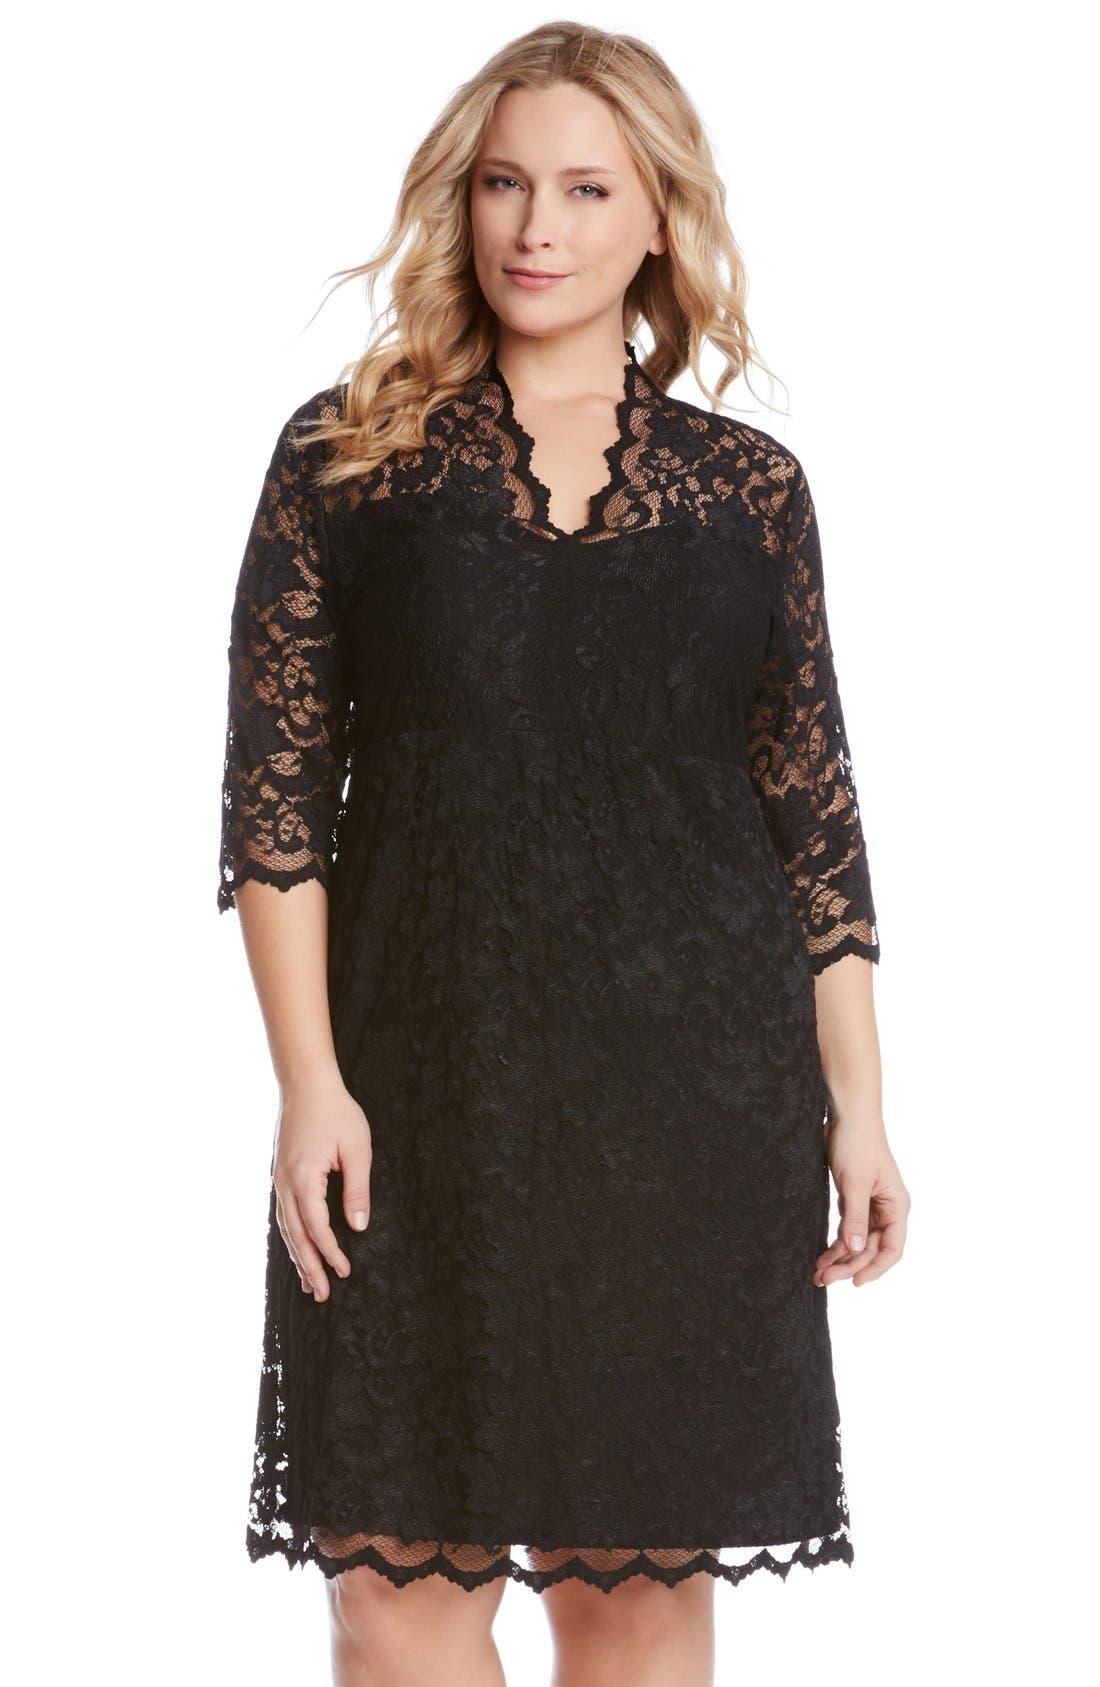 KAREN KANE, Scalloped Stretch Lace Dress, Alternate thumbnail 5, color, BLACK